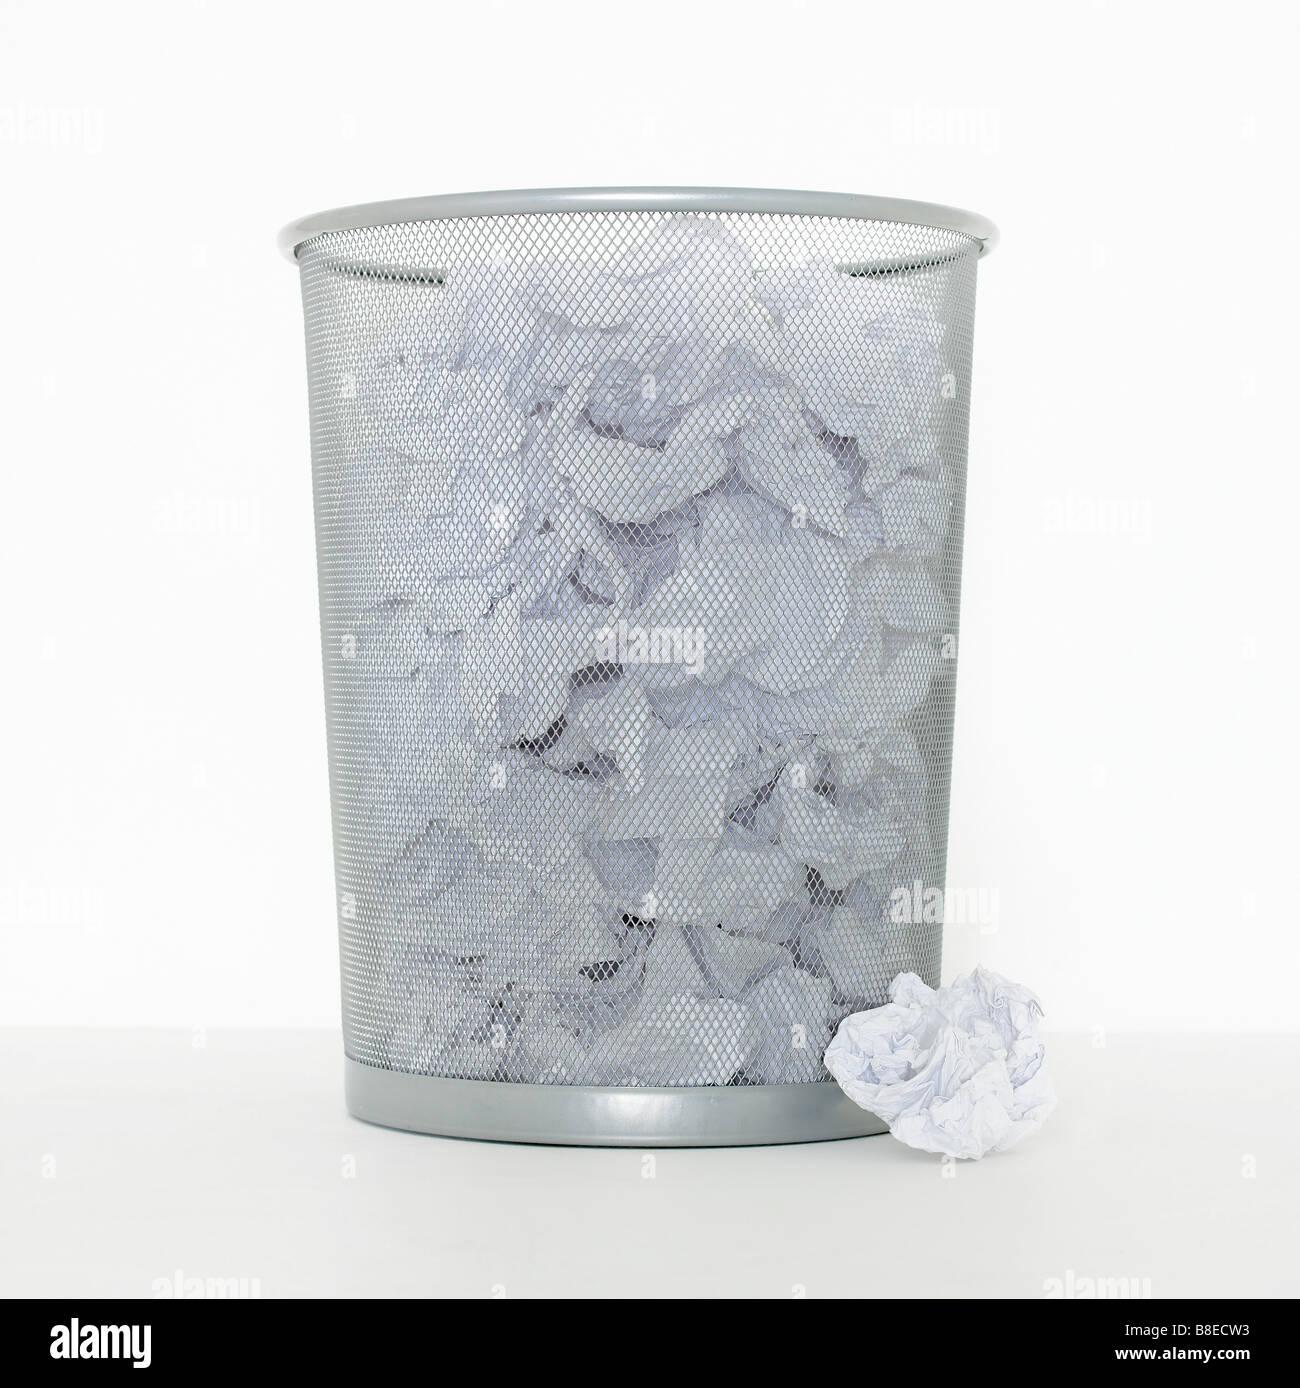 Metal Waste Bin Stock Photos & Metal Waste Bin Stock Images - Alamy